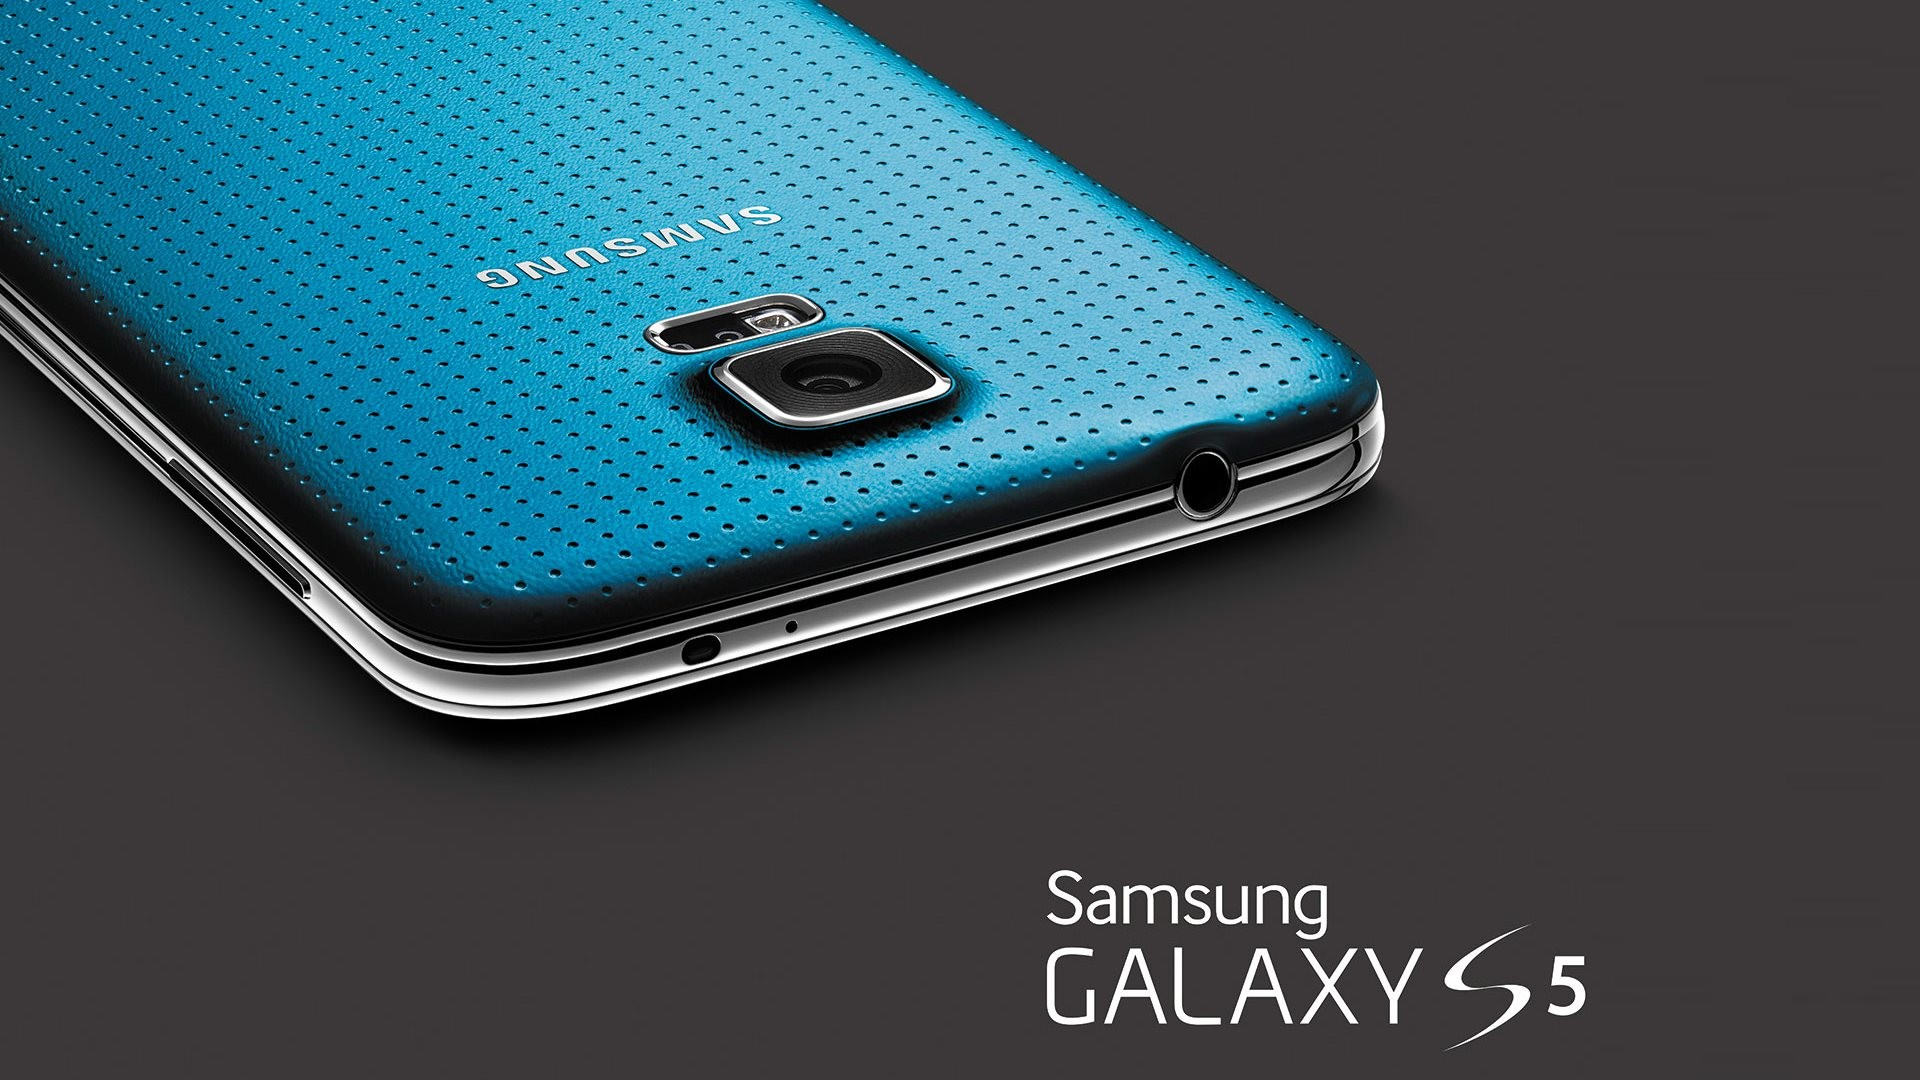 Samsung Galaxy S5 Wallpaper 89 images